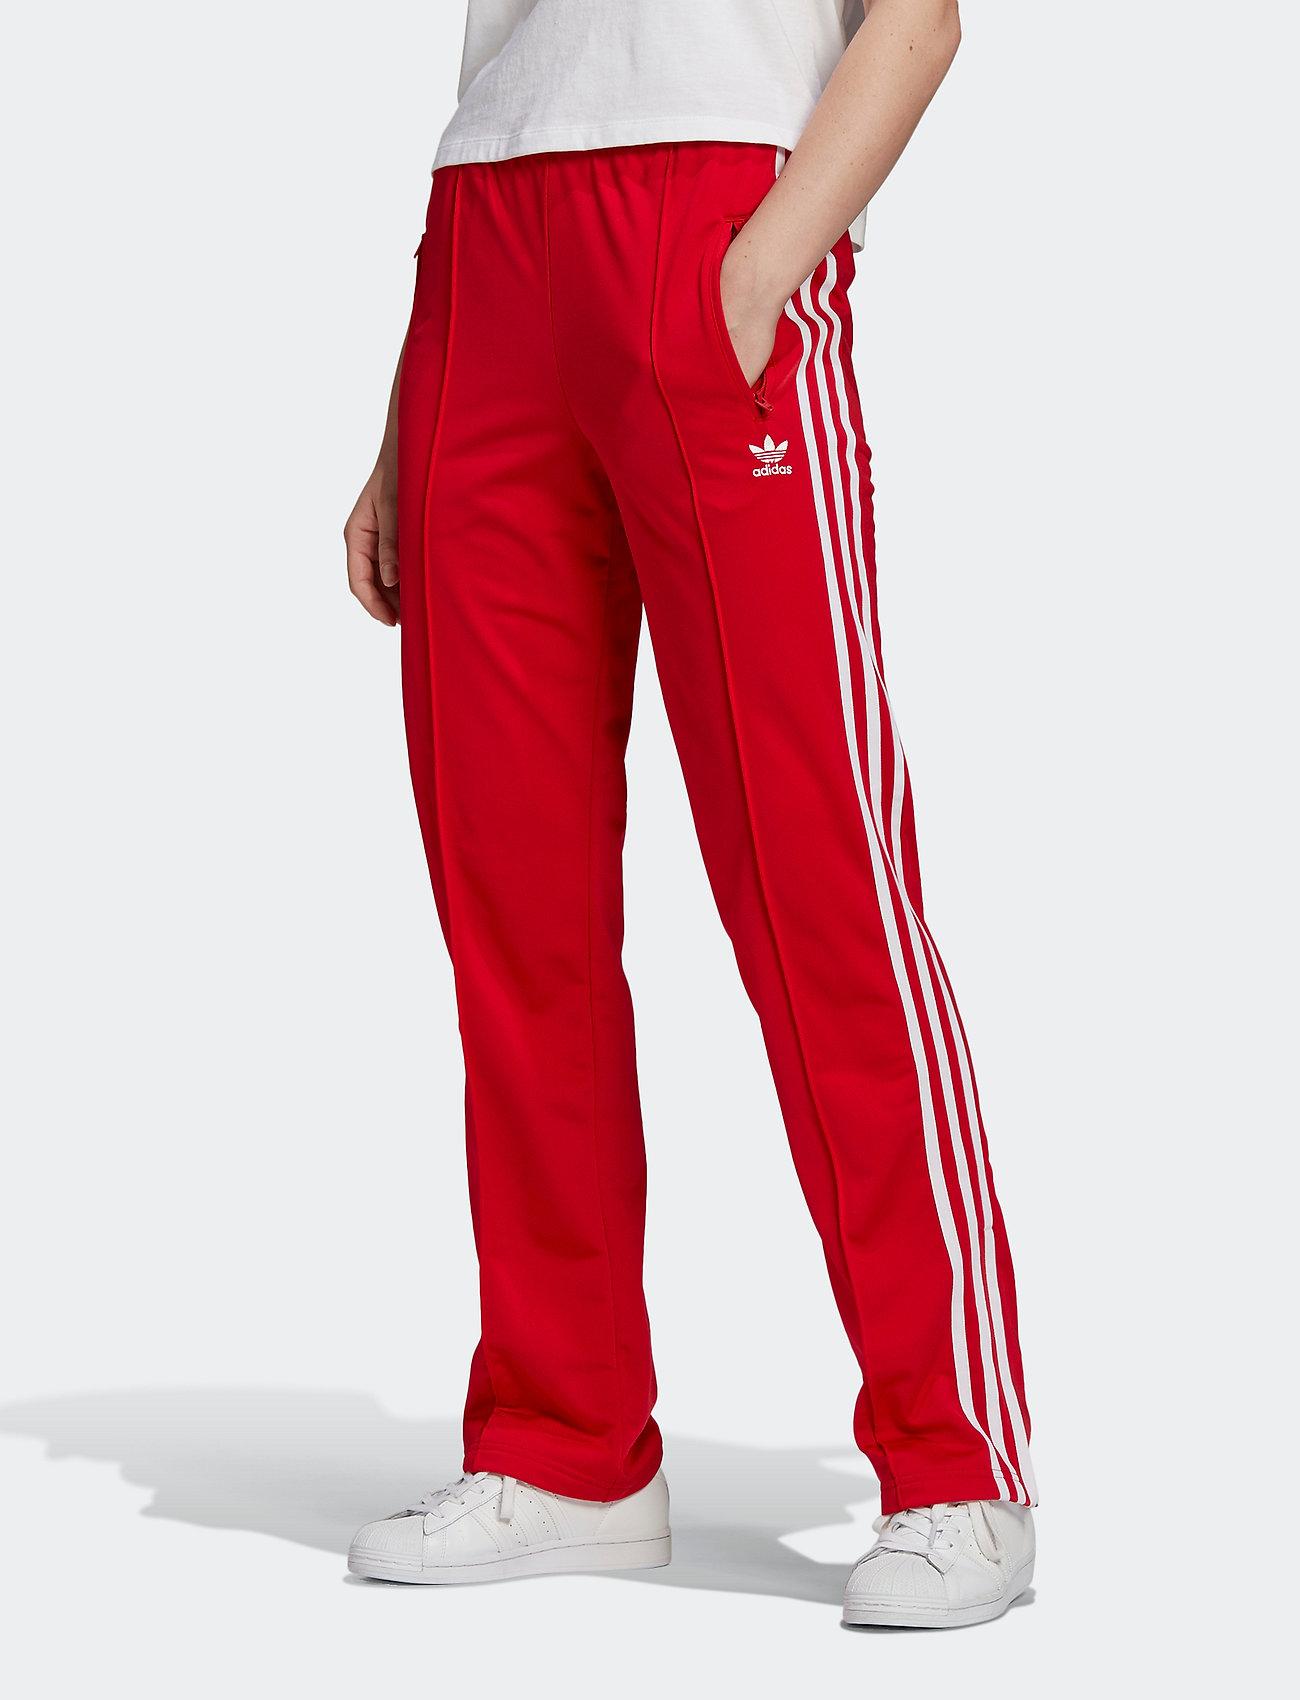 adidas Originals - Adicolor Classics Firebird Primeblue Track Pants W - trainingsbroek - scarle - 0